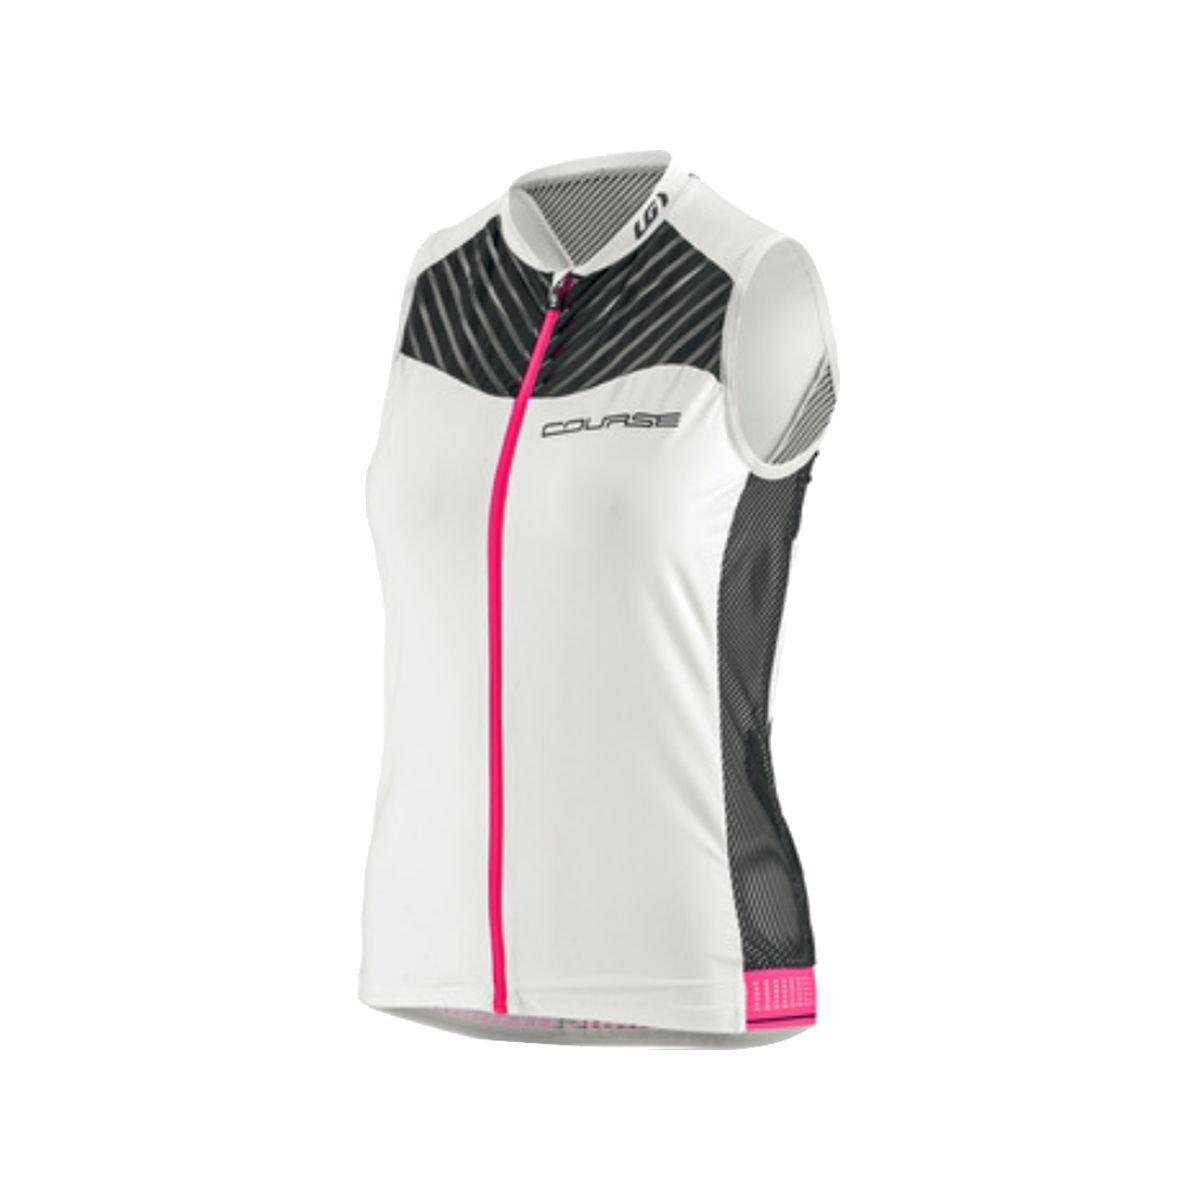 Louis Garneau Course 2 Sleeveless Top - Women's Black / White / Pink Glow Medium